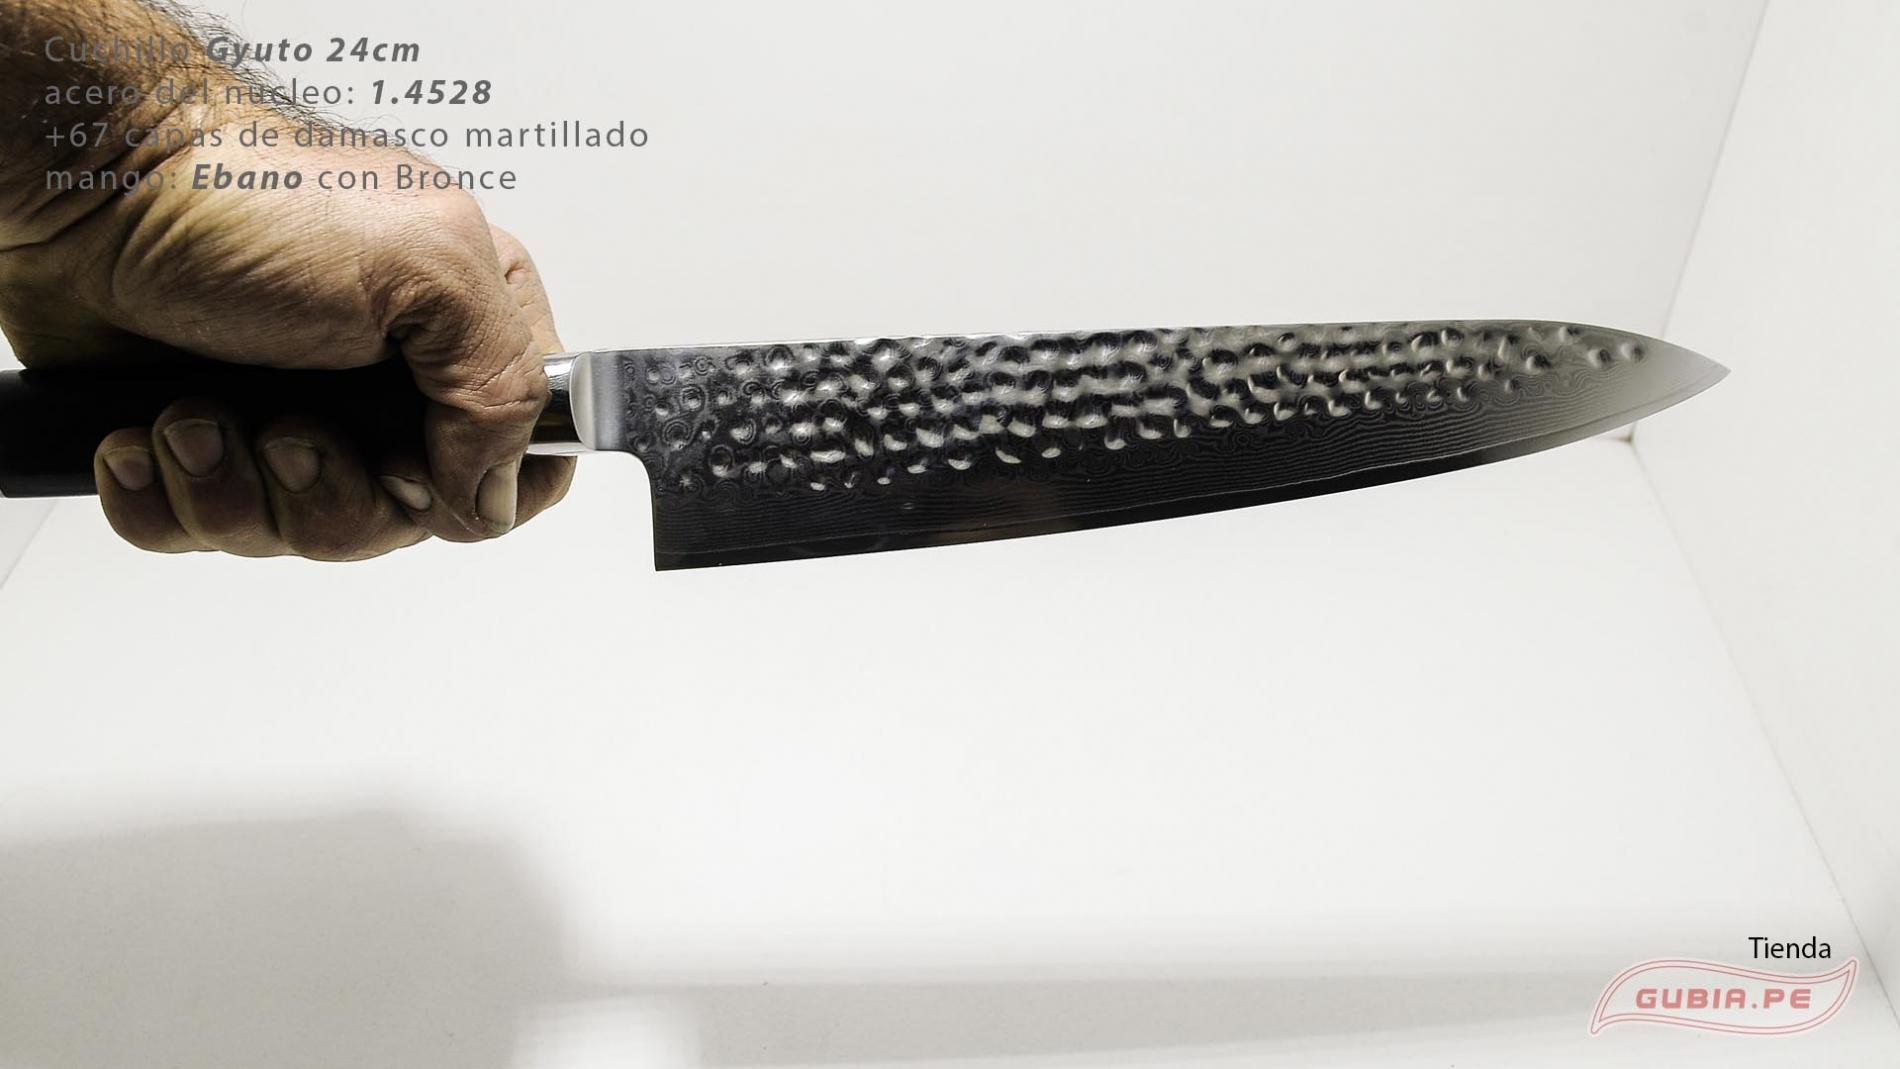 B1zEg24-Cuchillo Gyuto 24cm acero 1.4528+damasco Ebano+Bronce B1zEg24-max-7.